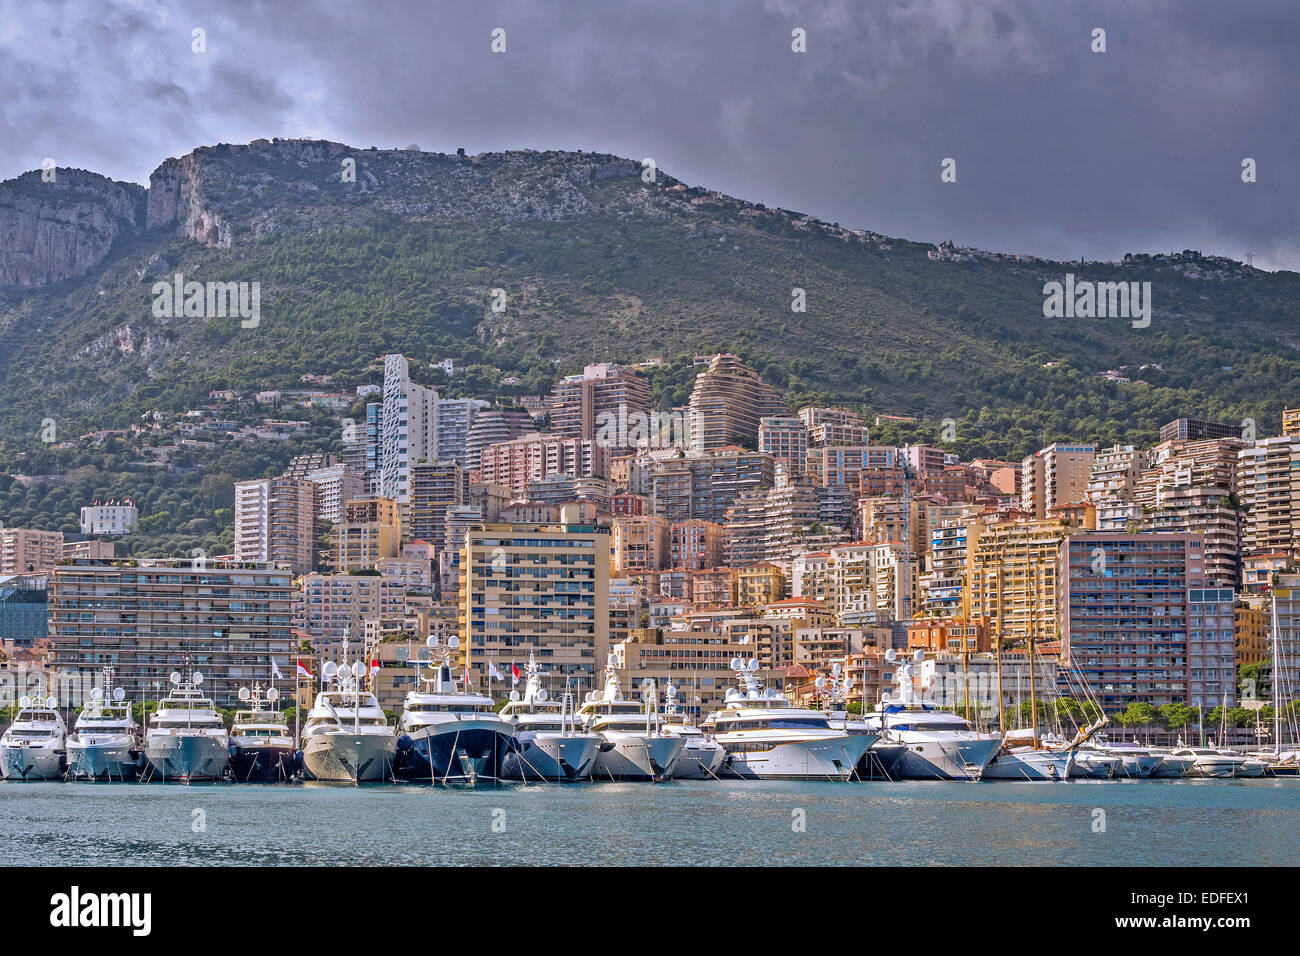 Harbour and City Monte Carlo Monaco - Stock Image